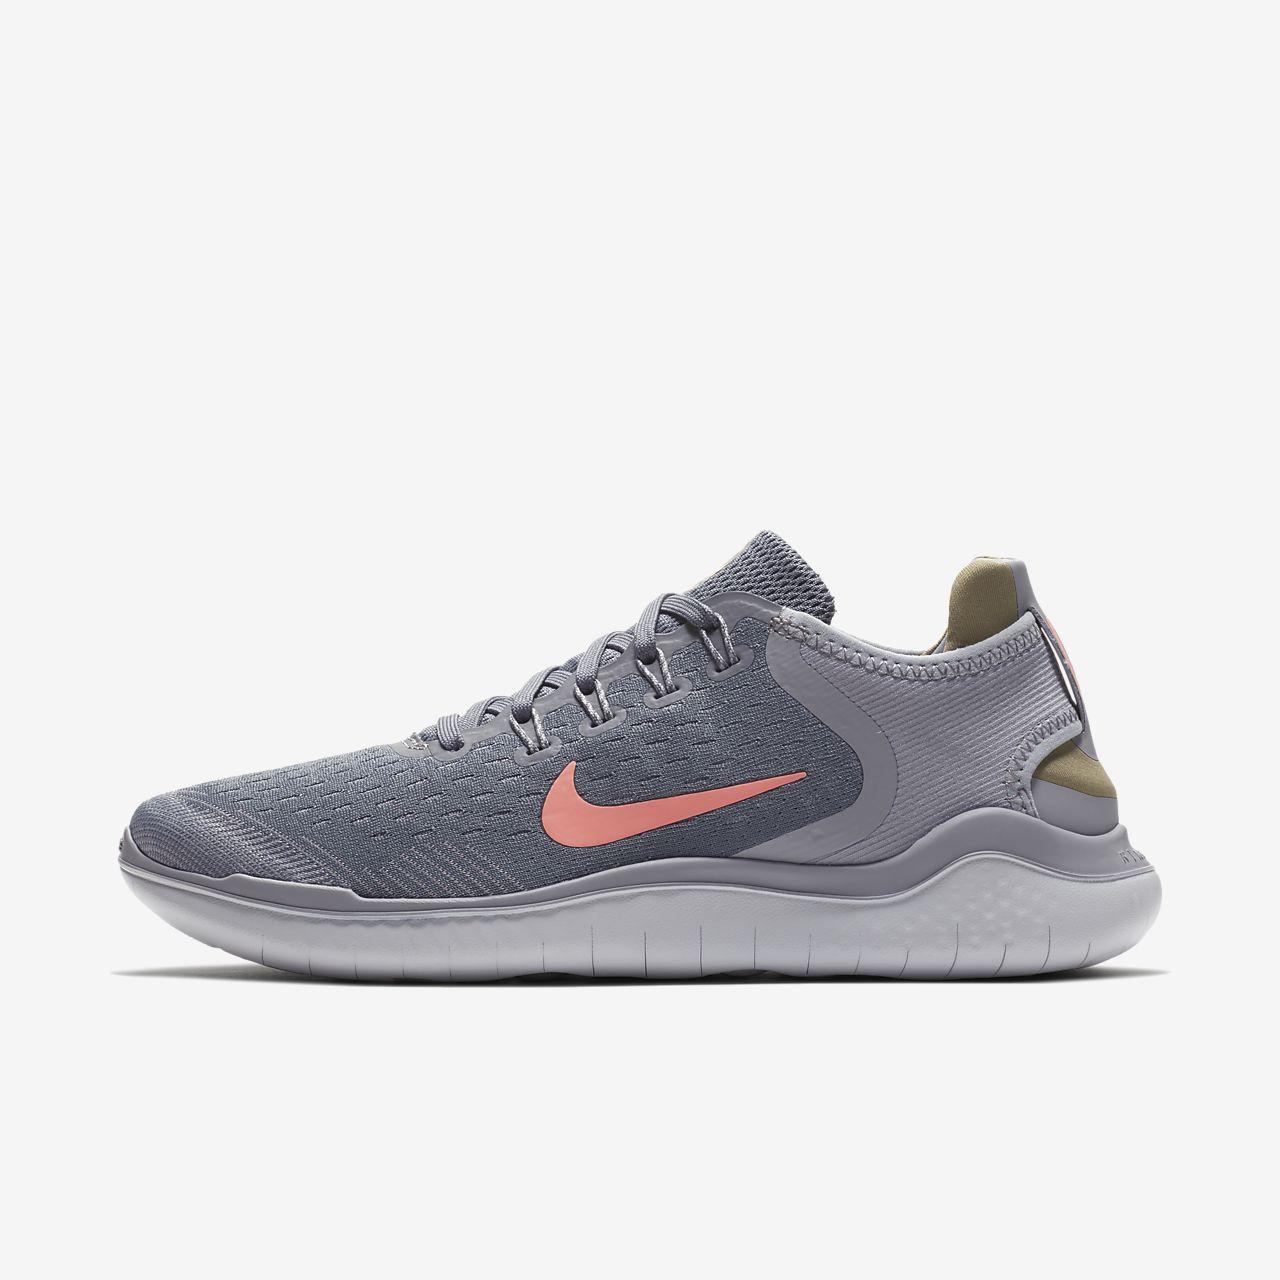 watch c4232 d500b Nike Free RN 2018 Hardloopschoen voor dames